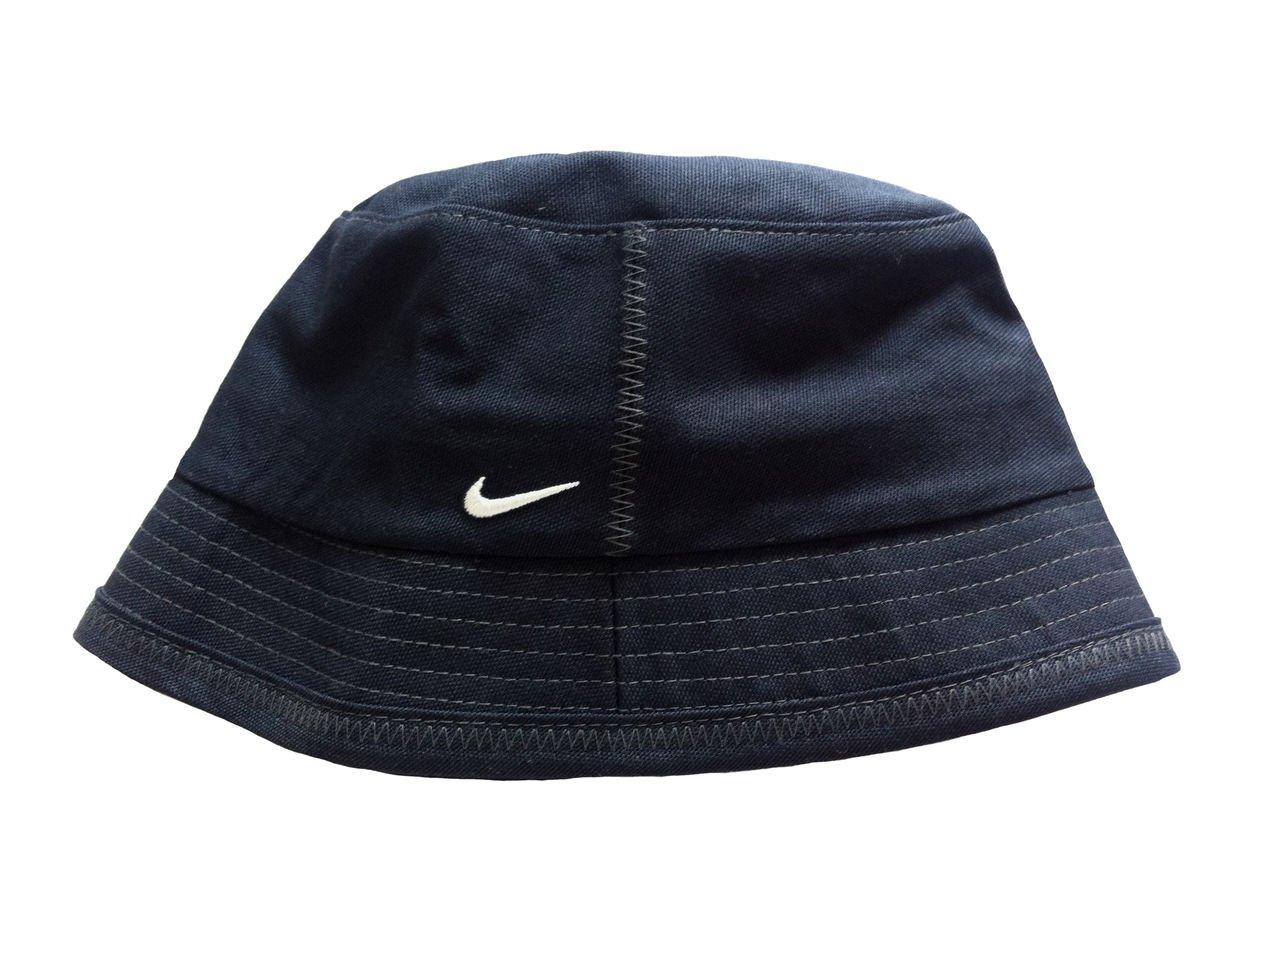 Nike Swoosh Unisex Adult   Childs Fisherman Bucket Hat Sun Holiday Cap.  Black. Size XS S 566561-010  Amazon.co.uk  Sports   Outdoors d7254ec56a3